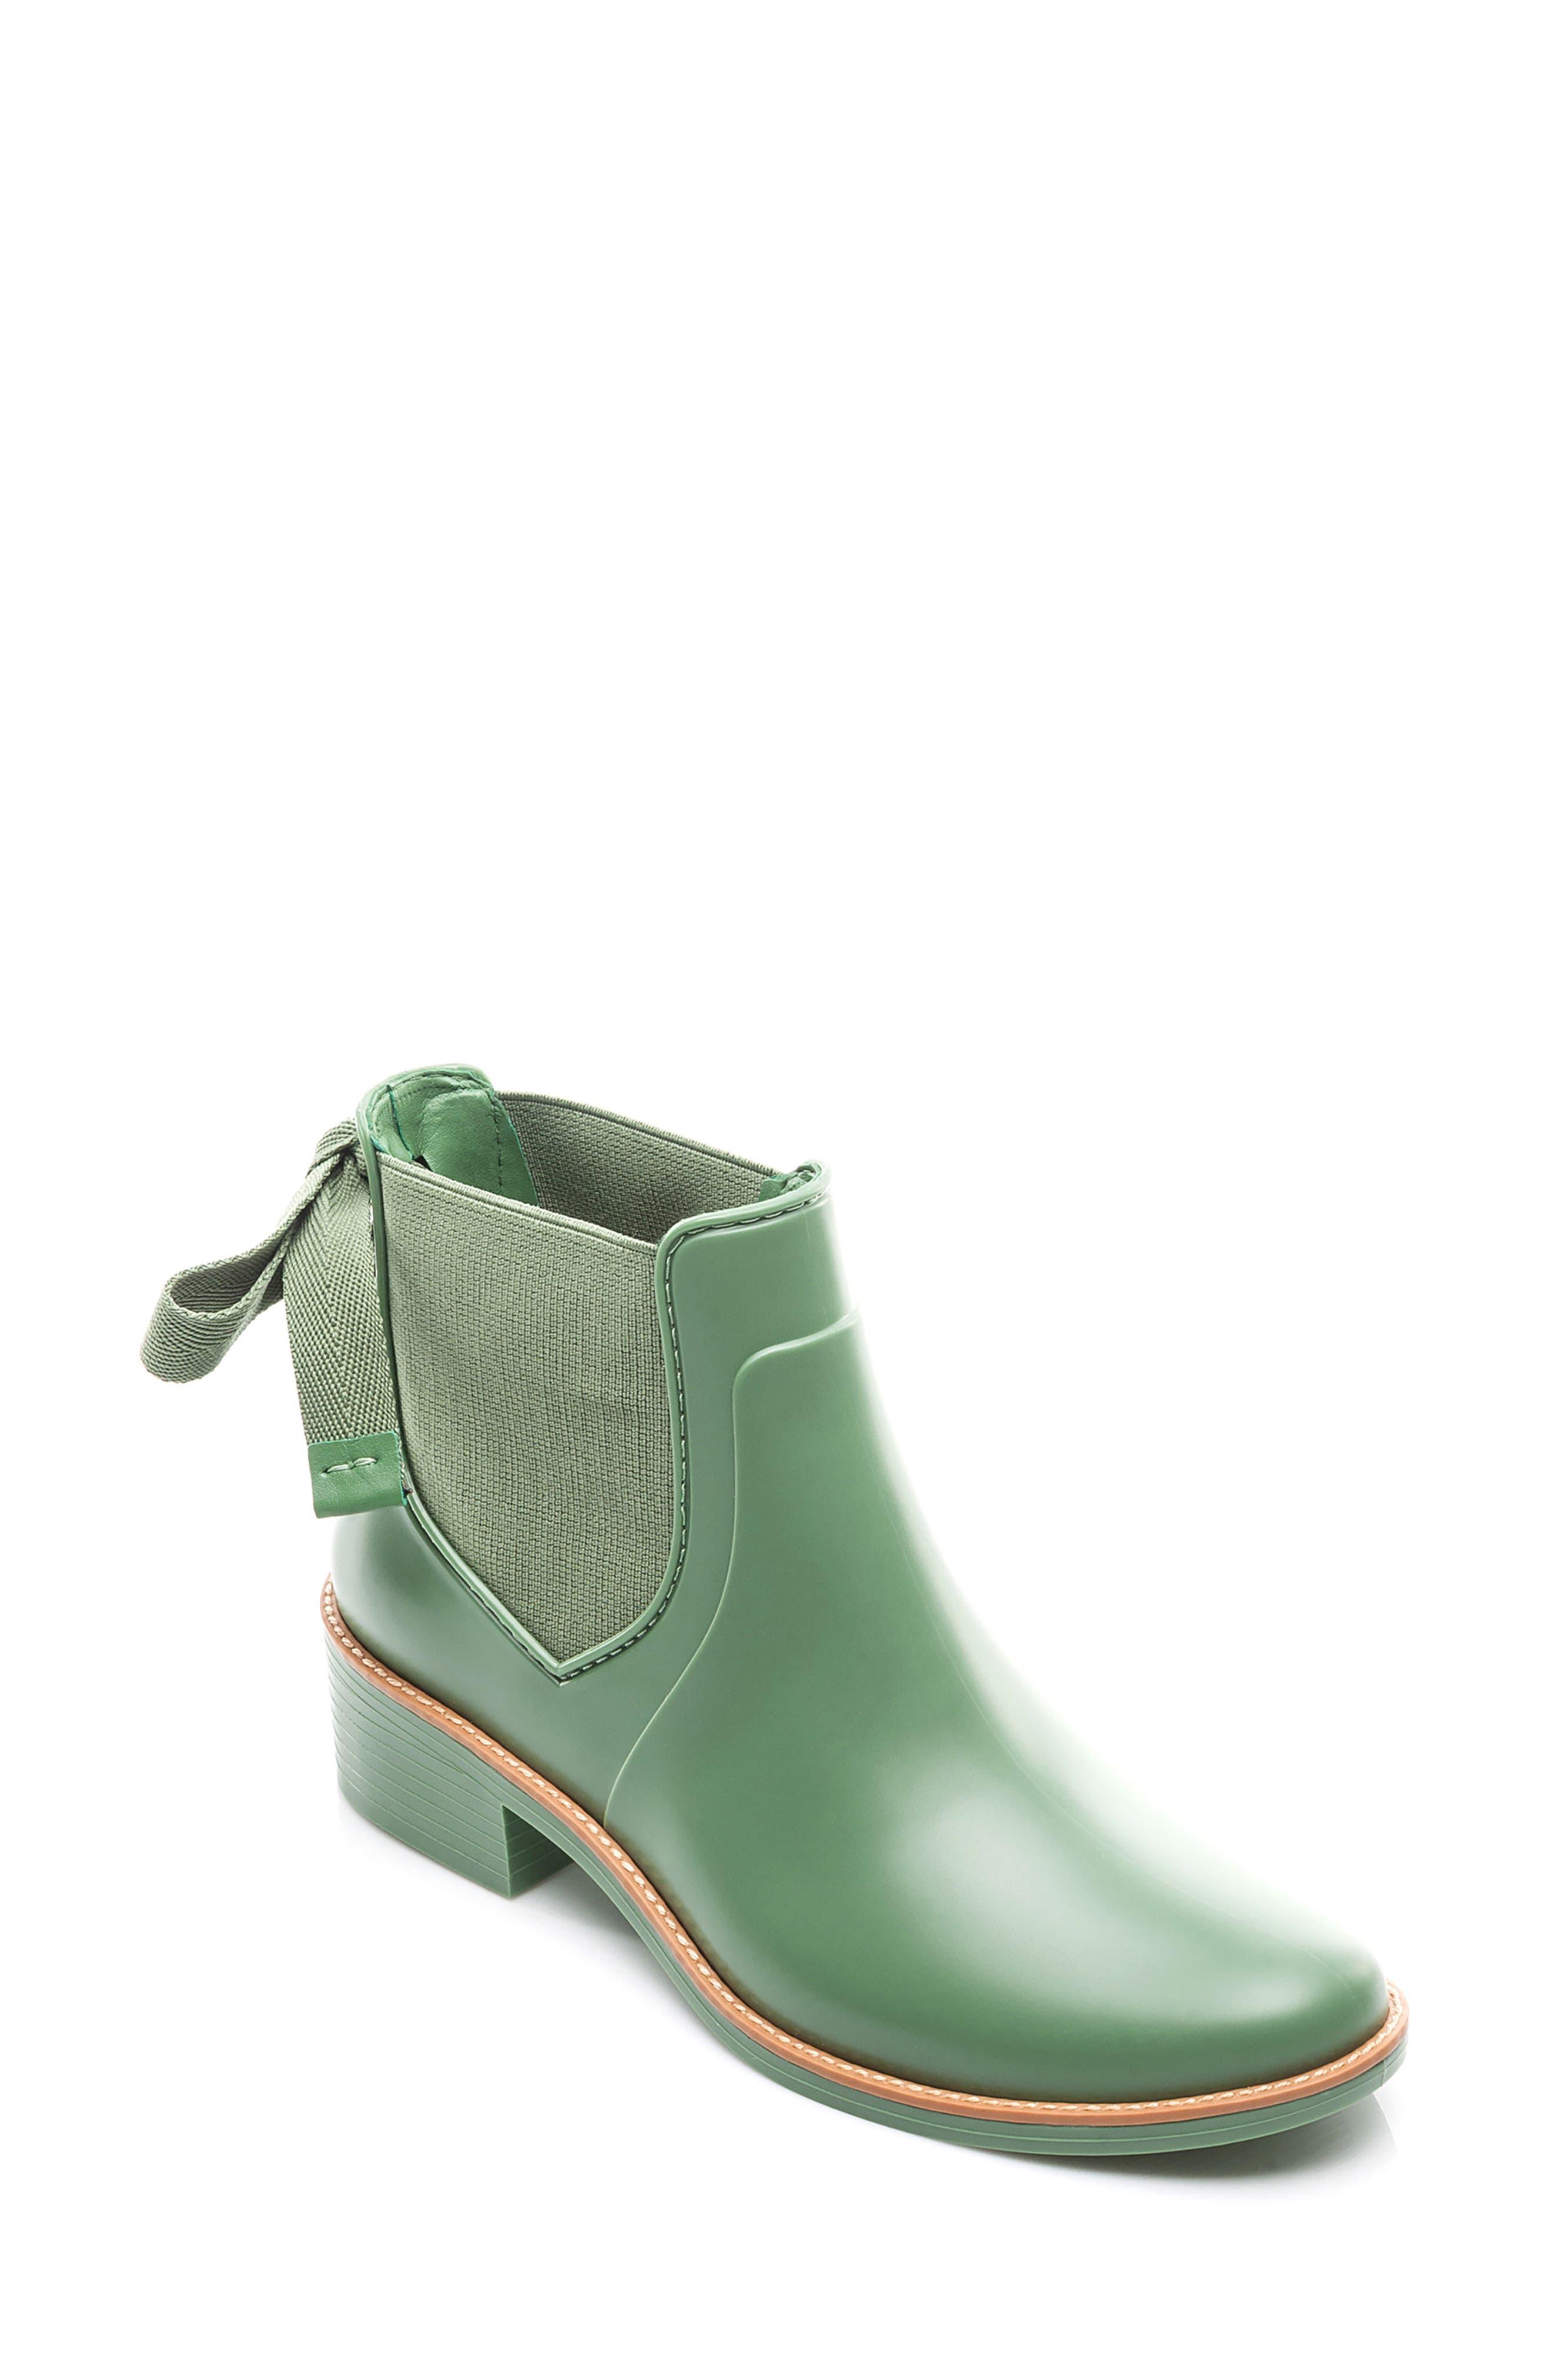 Main Image - Bernardo Footwear Paige Rain Boot (Women)